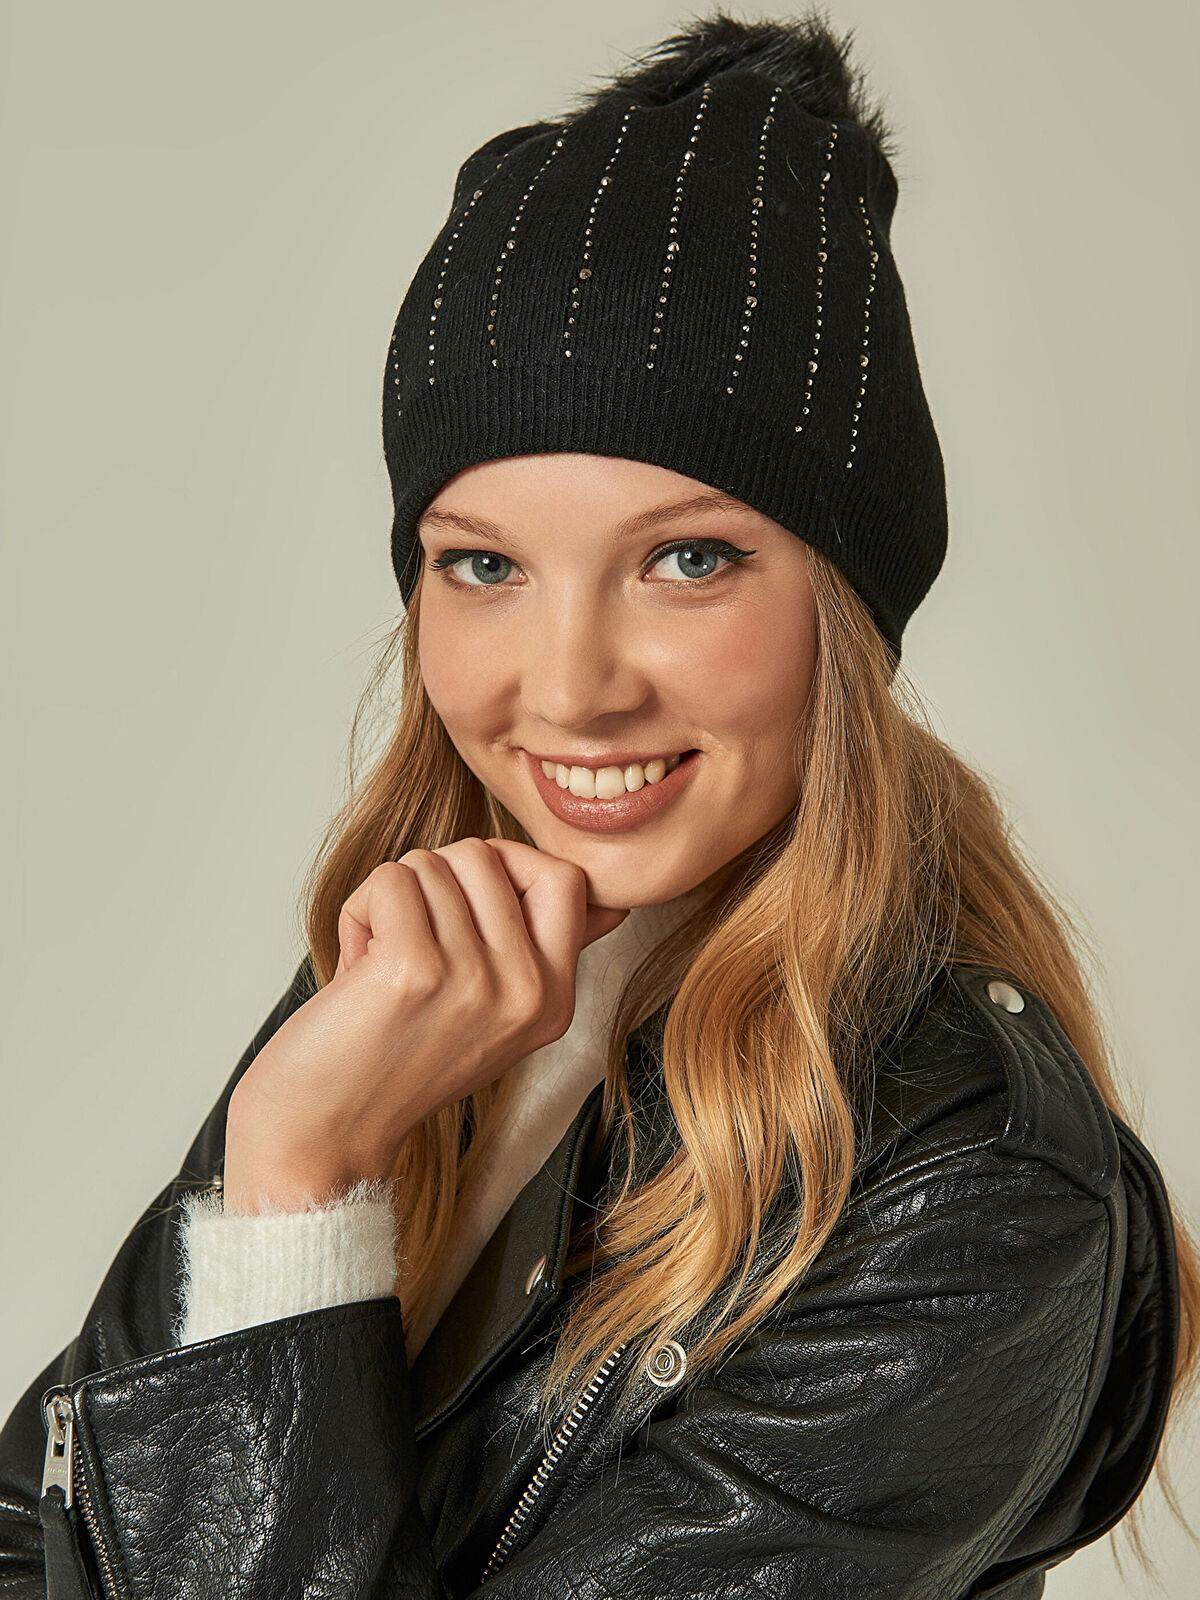 Axesoire Taşlı Ponponlu Siyah Coton Bere - Markalar